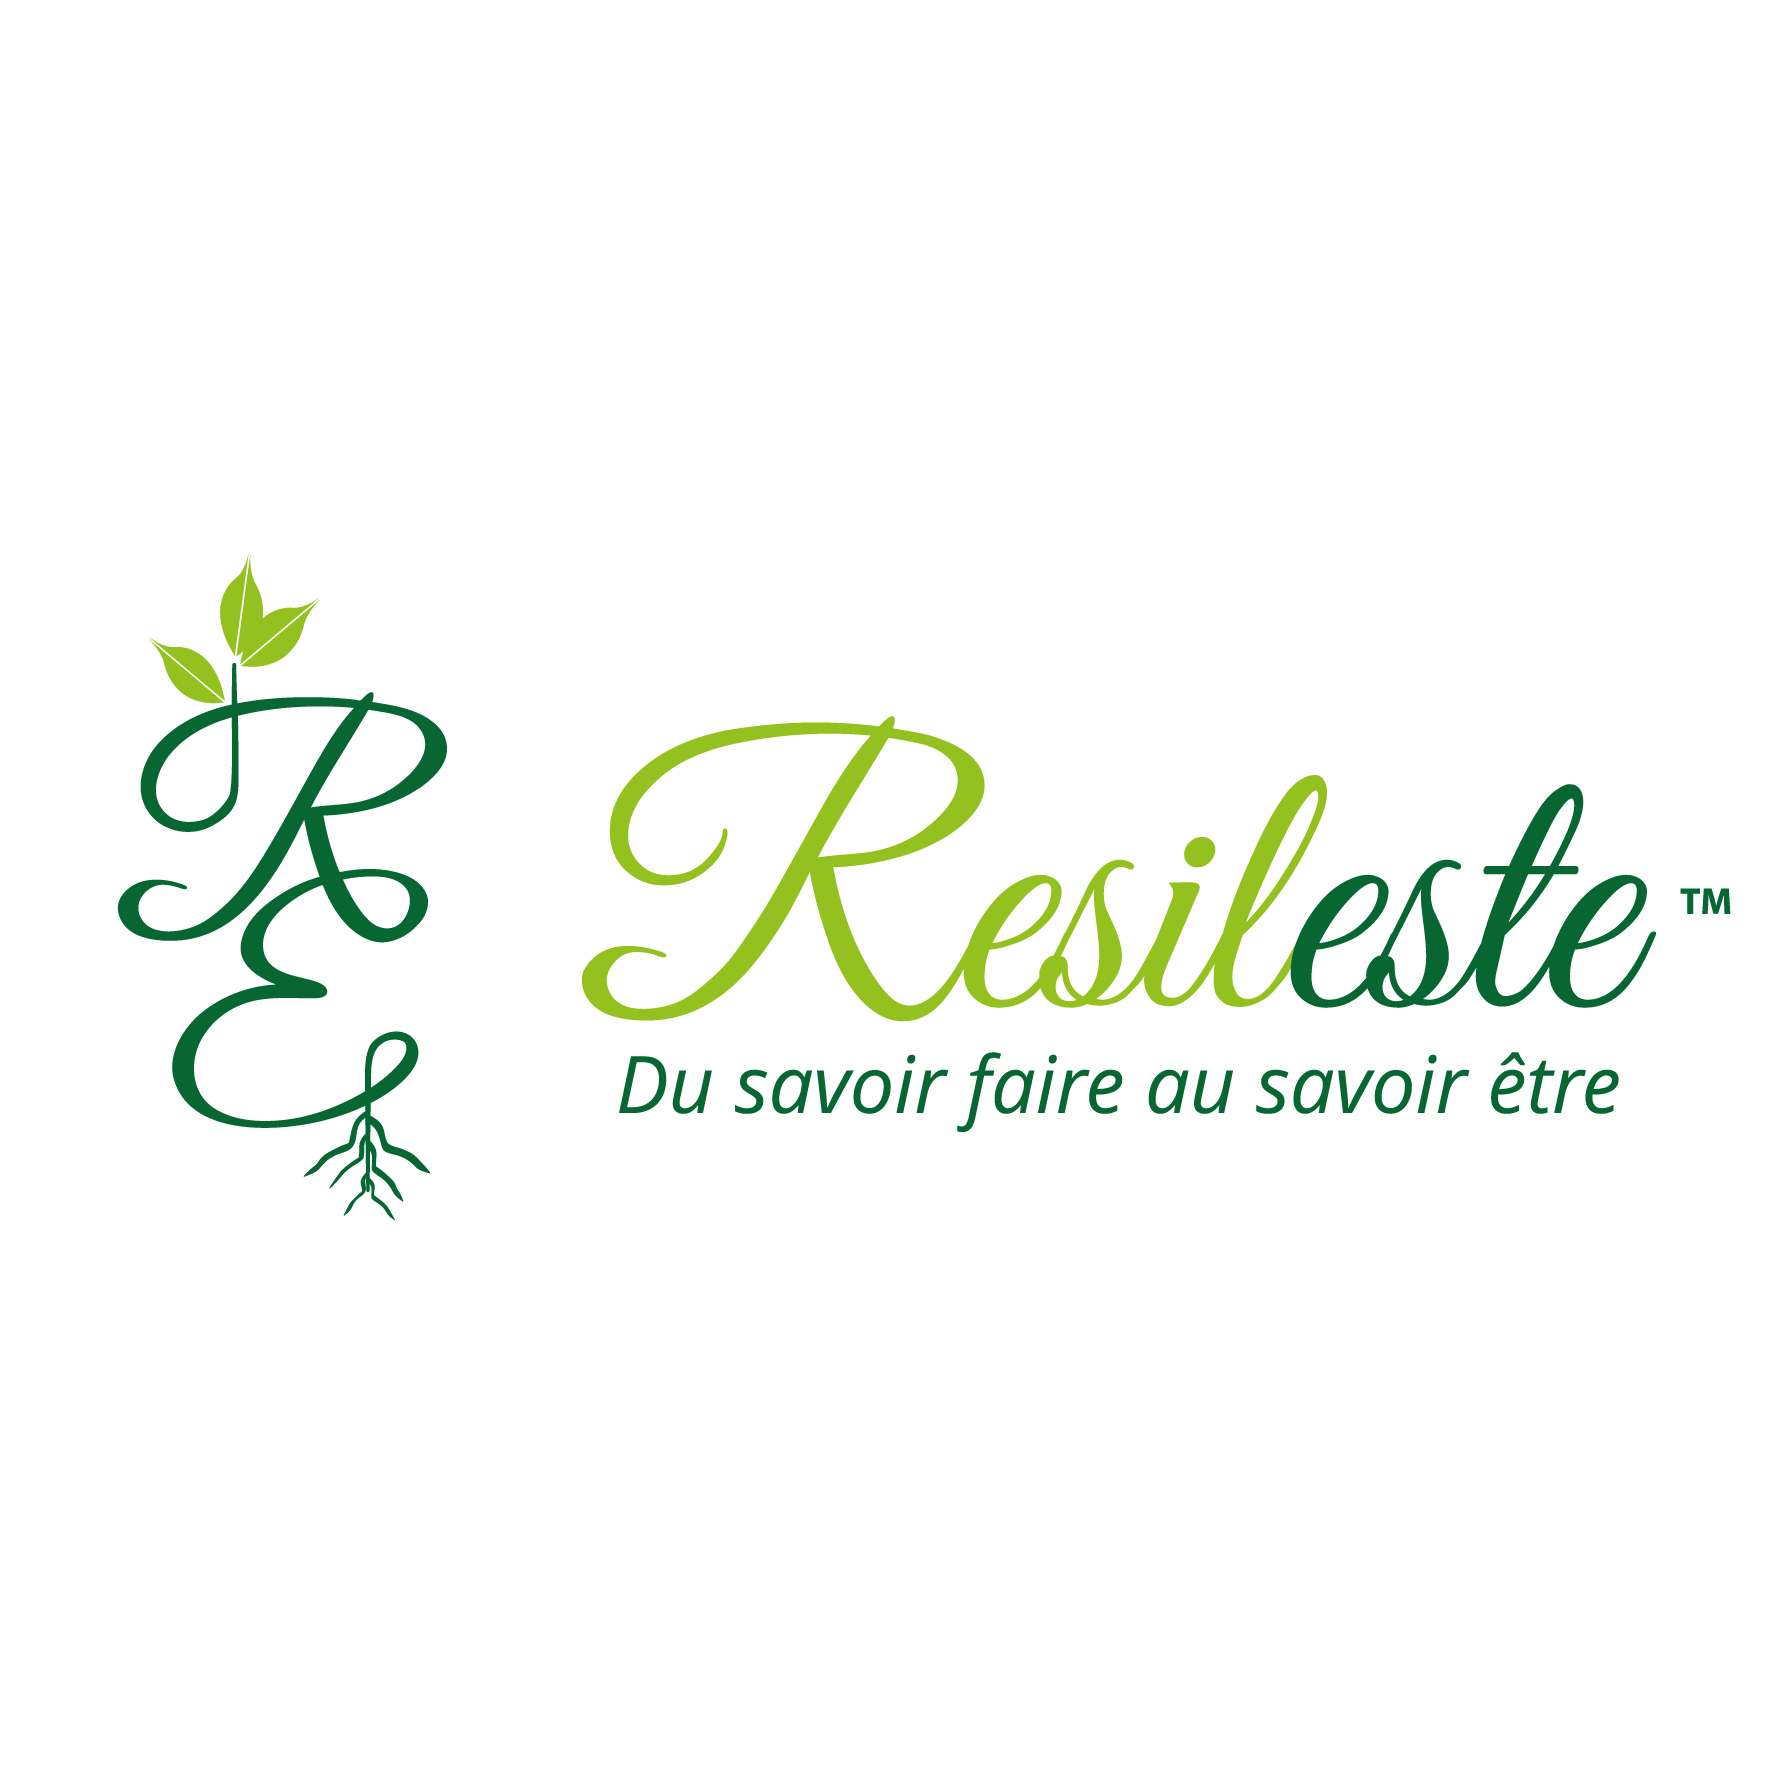 Clinique Resileste